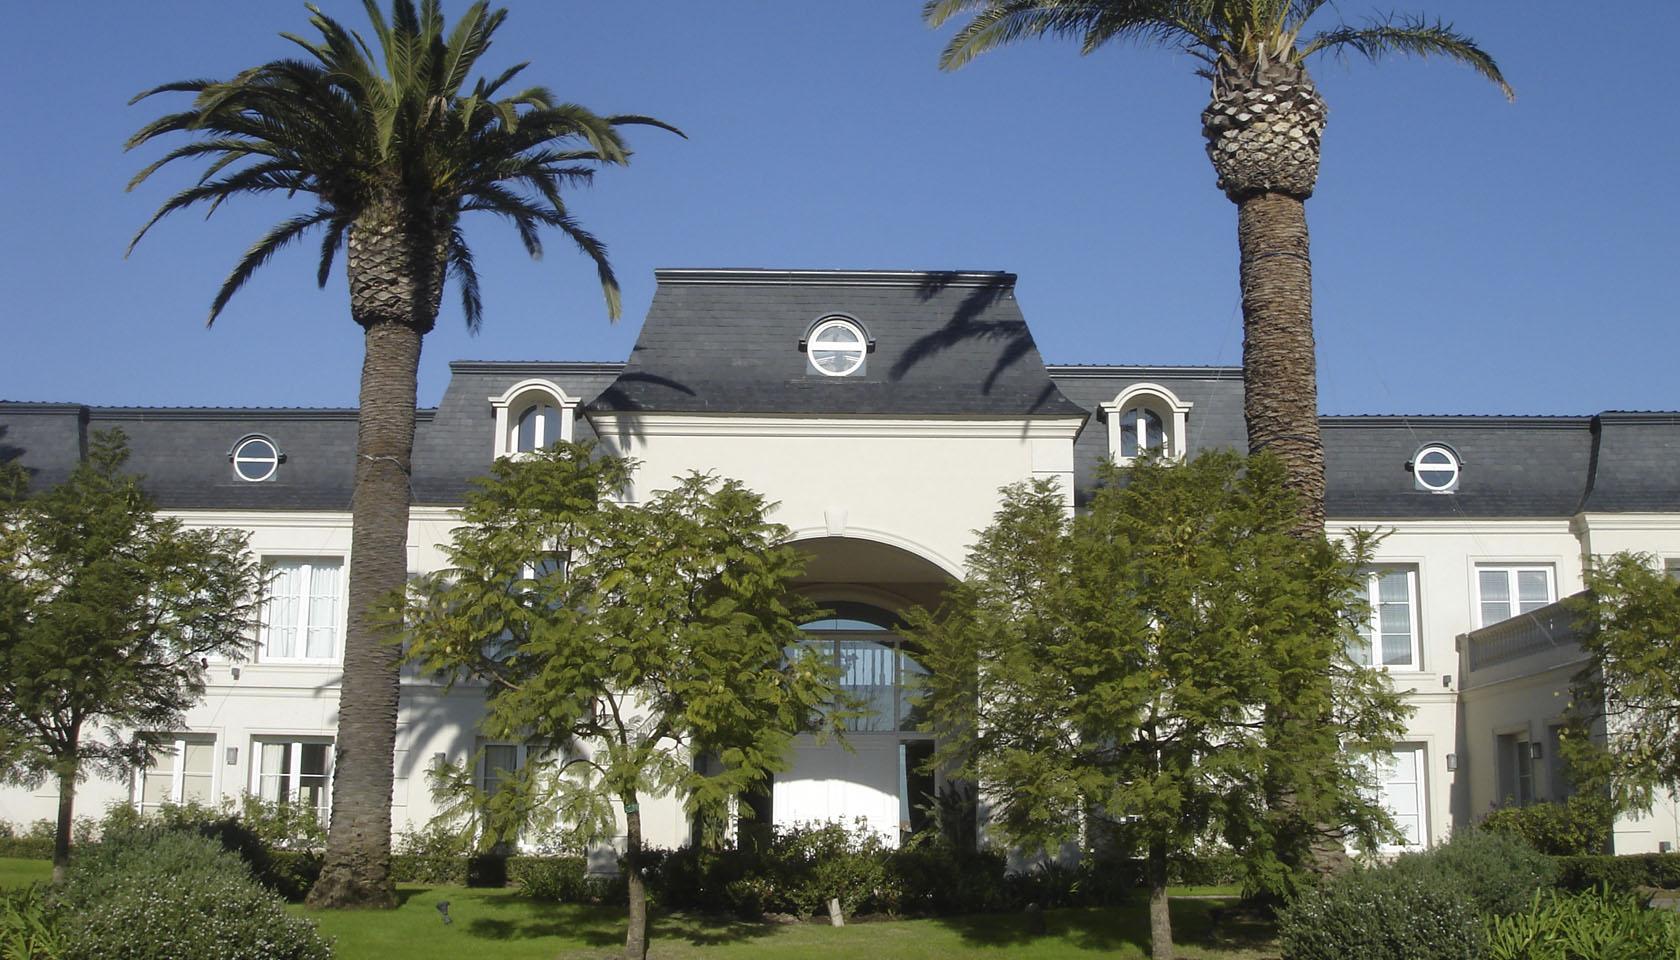 arquitectura neoclásica, casas lujosas, casas con mansarda